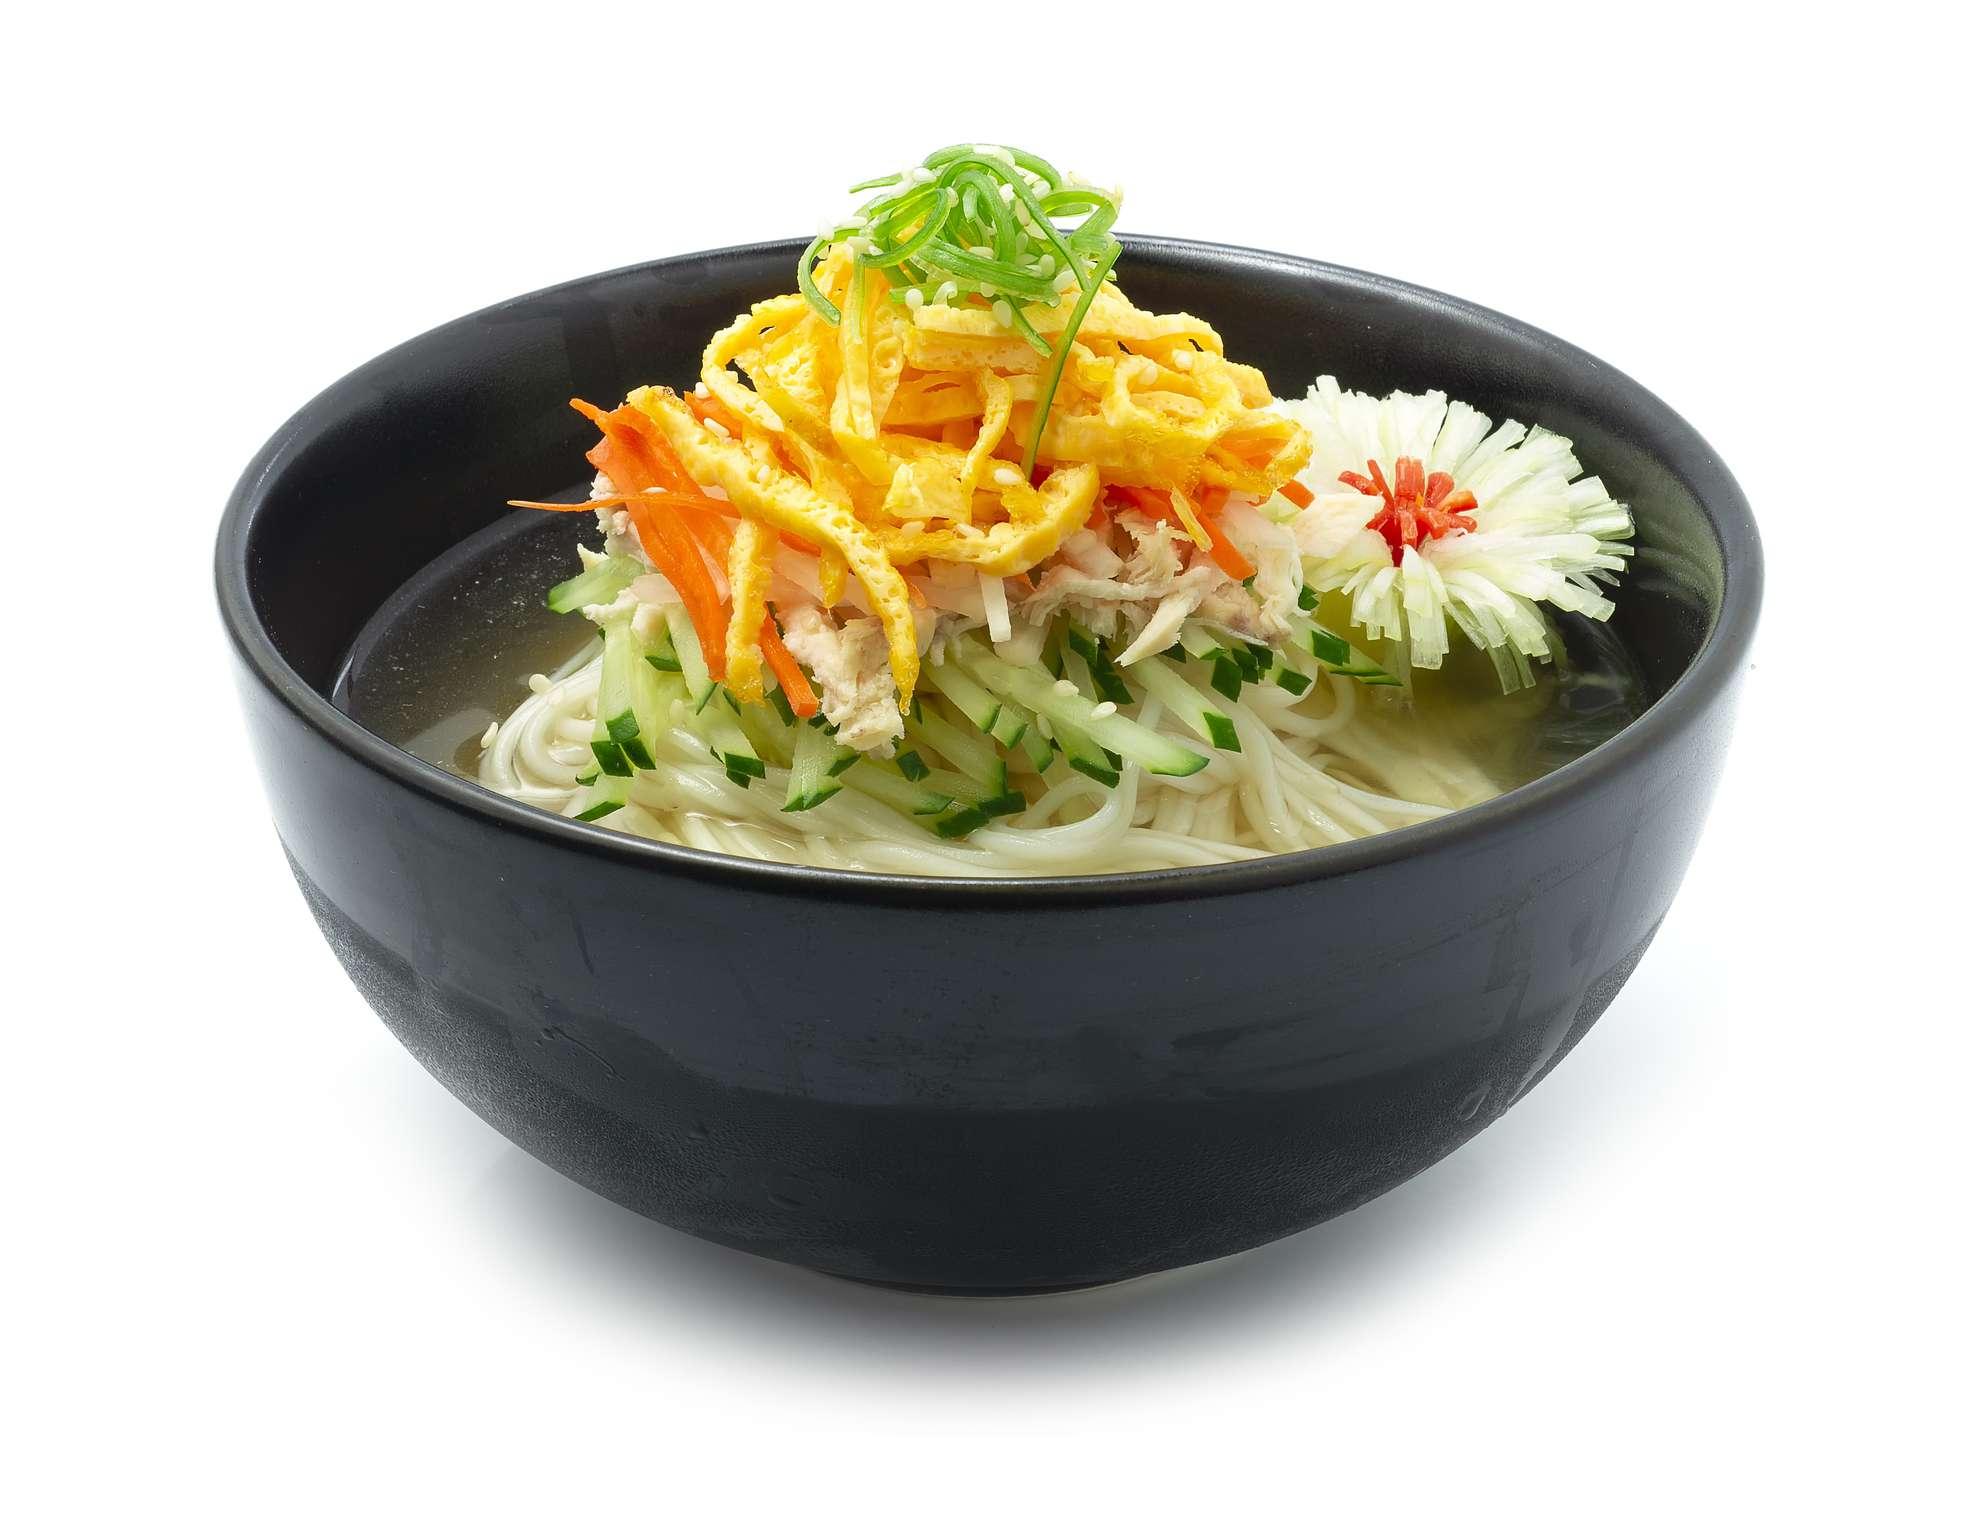 Korean Cold Noodles Soup Naengmyeon Traditional Korean Food Popular Summer dish